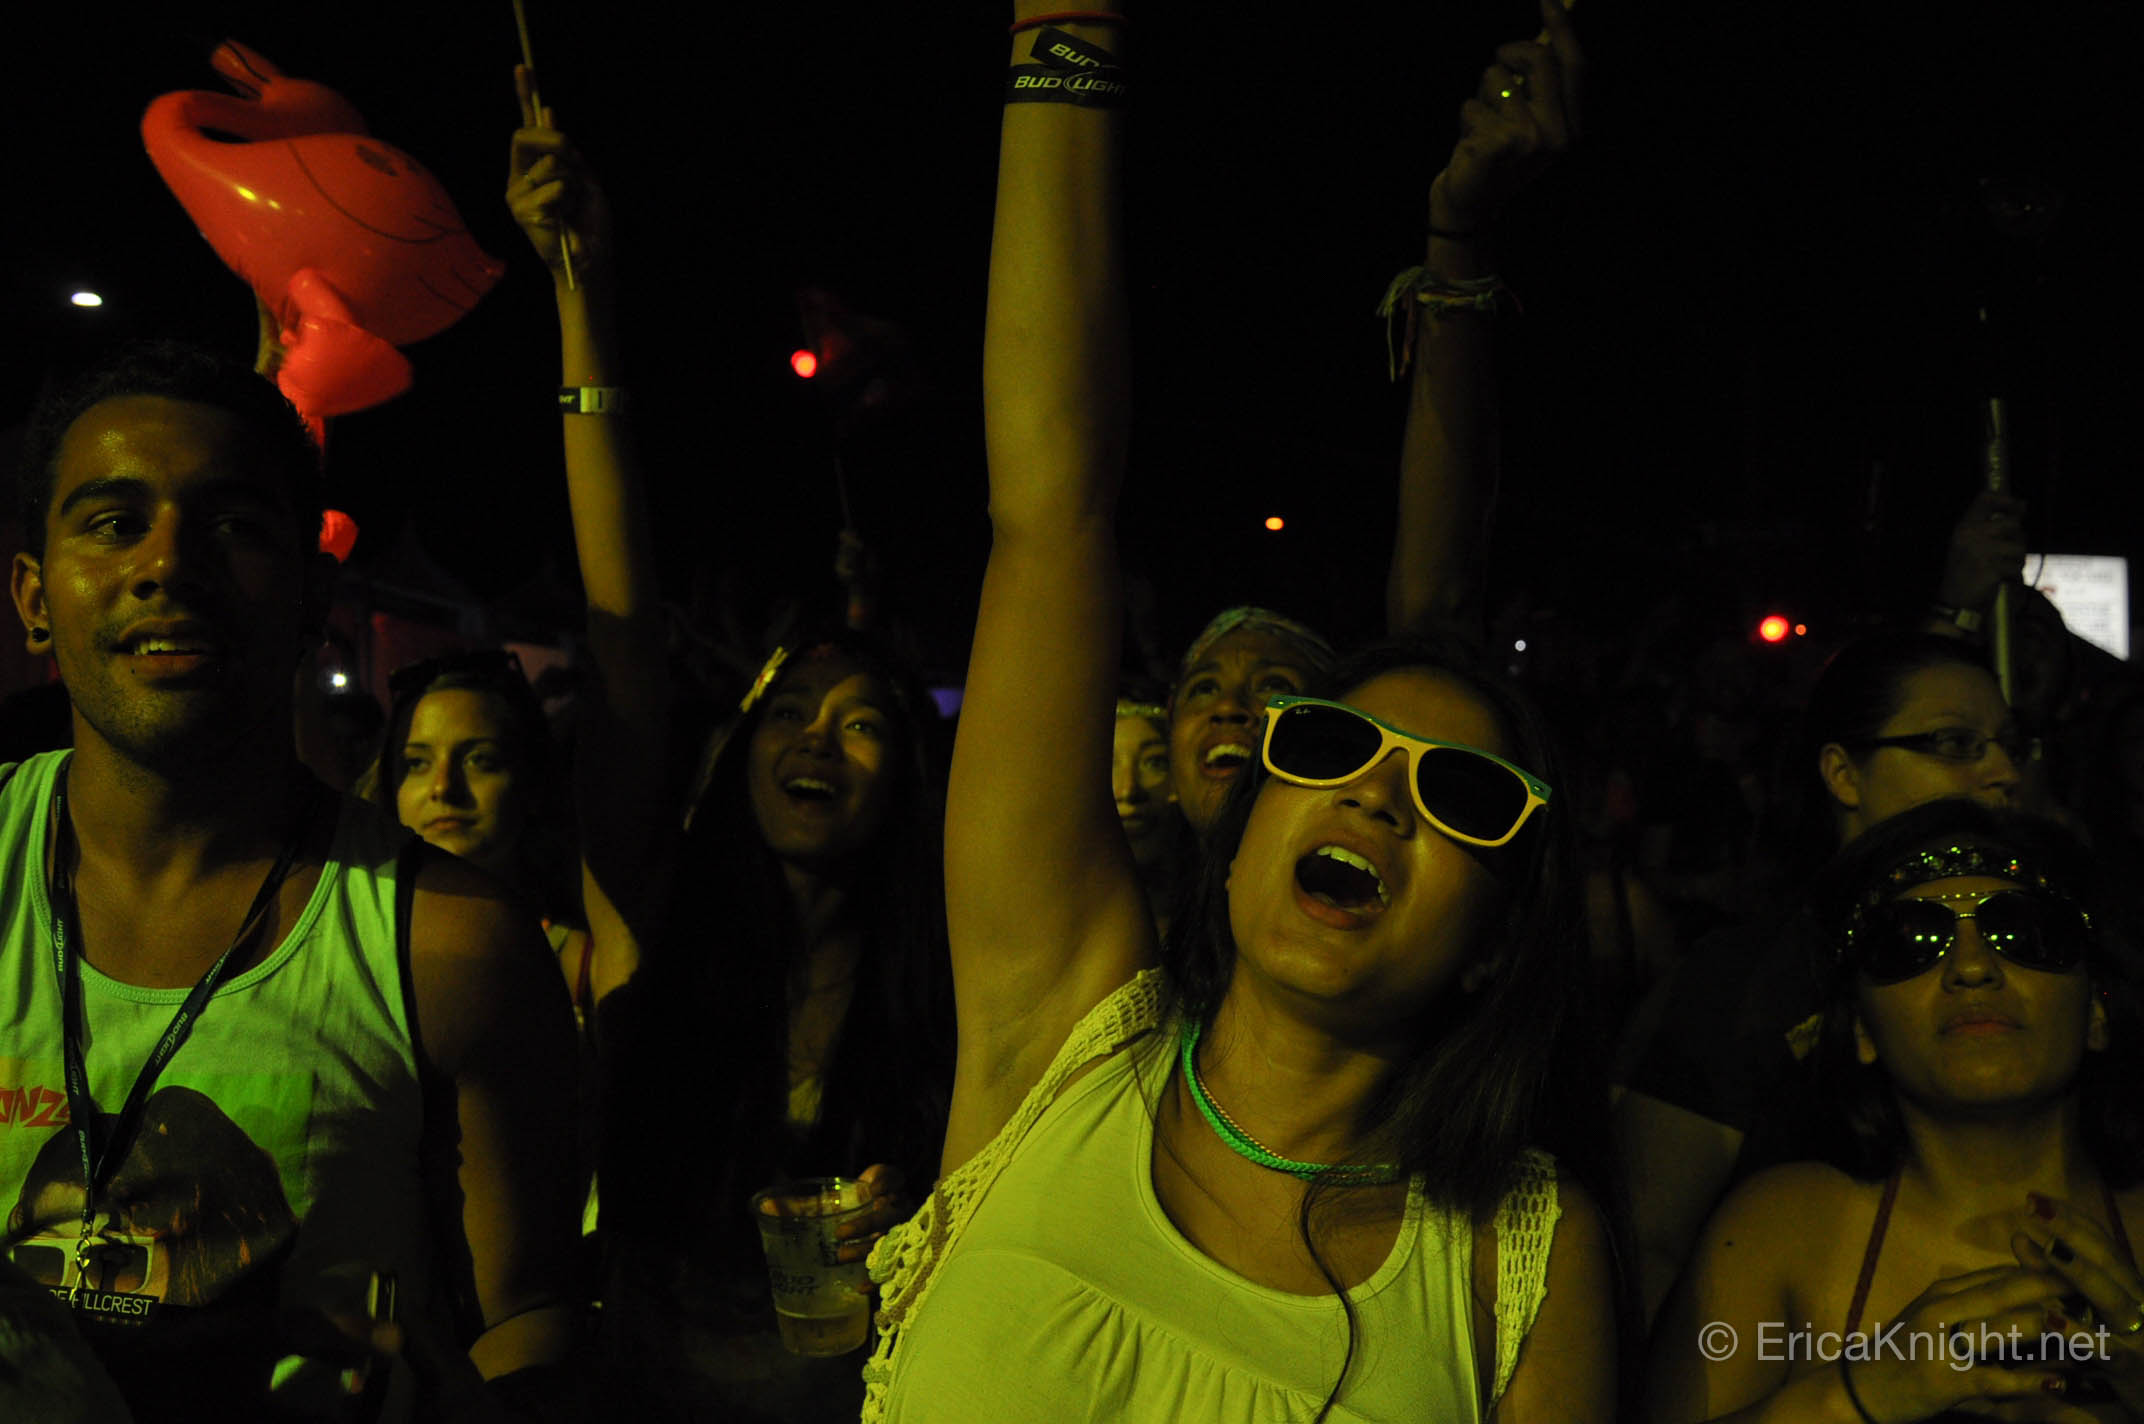 Live music fans - San Diego, CA